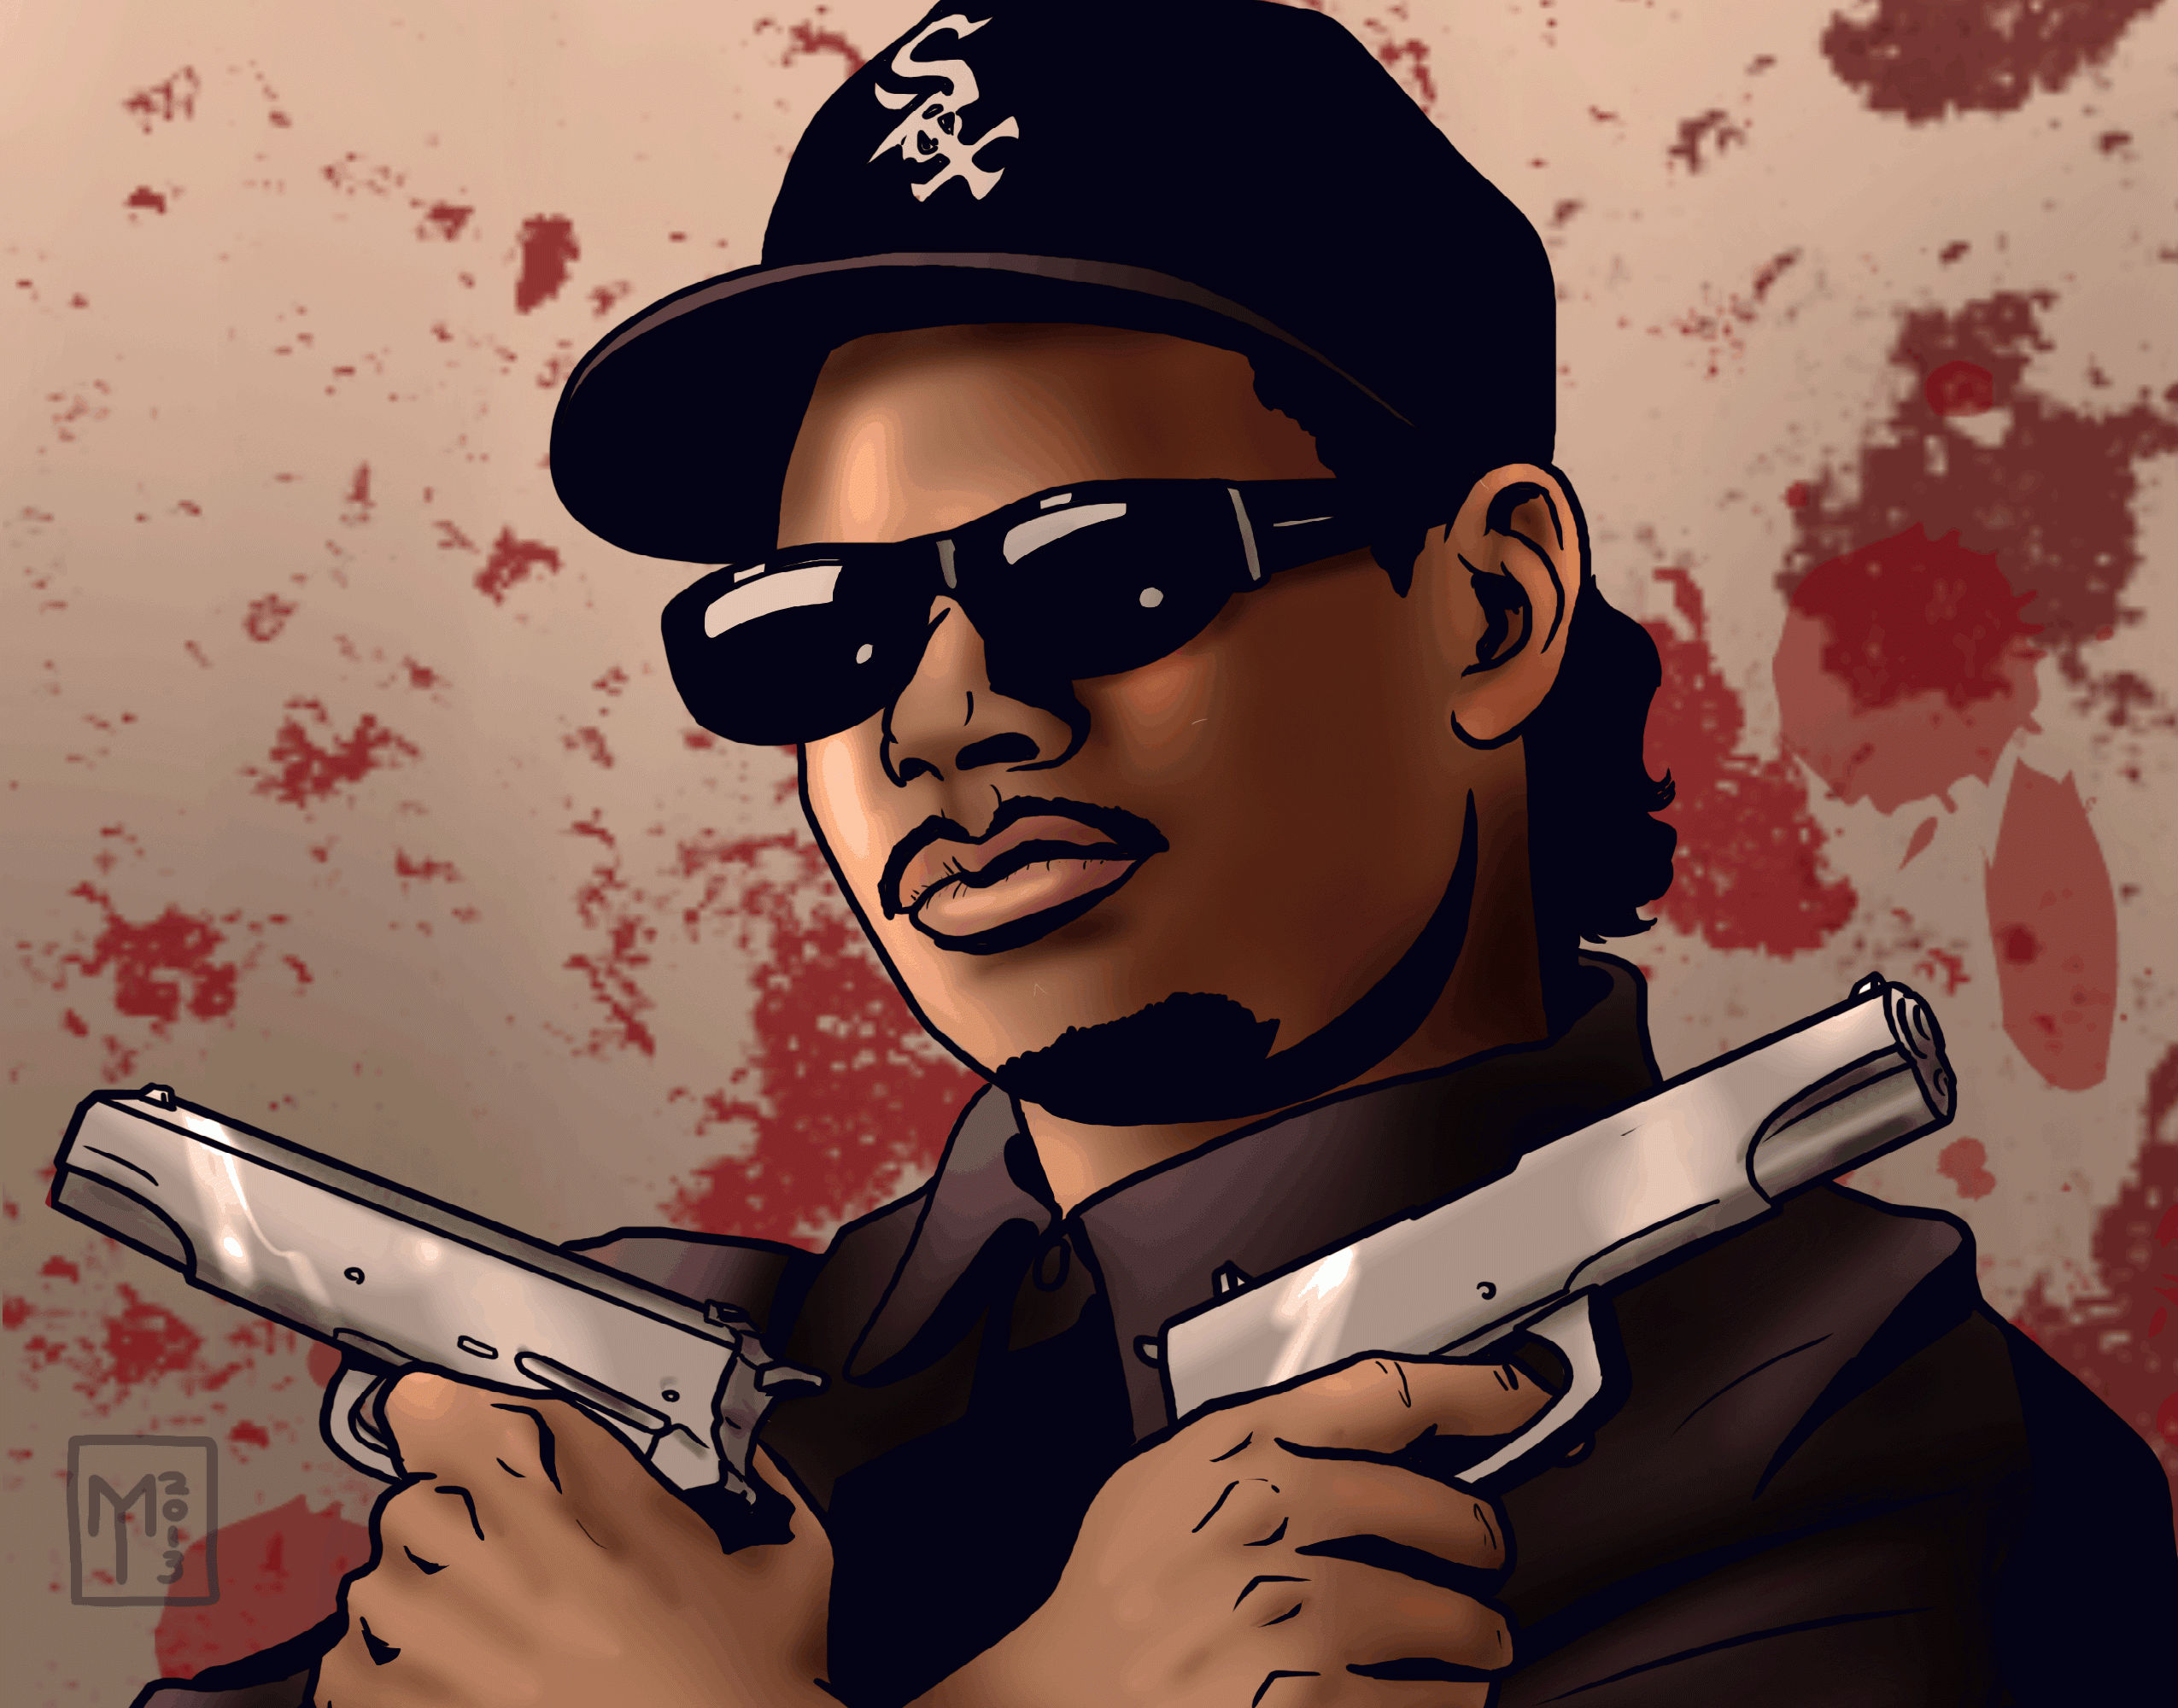 Eazy E nwa gangsta rapper rap hip hop eazy e weapon gun d wallpaper 2550x2000